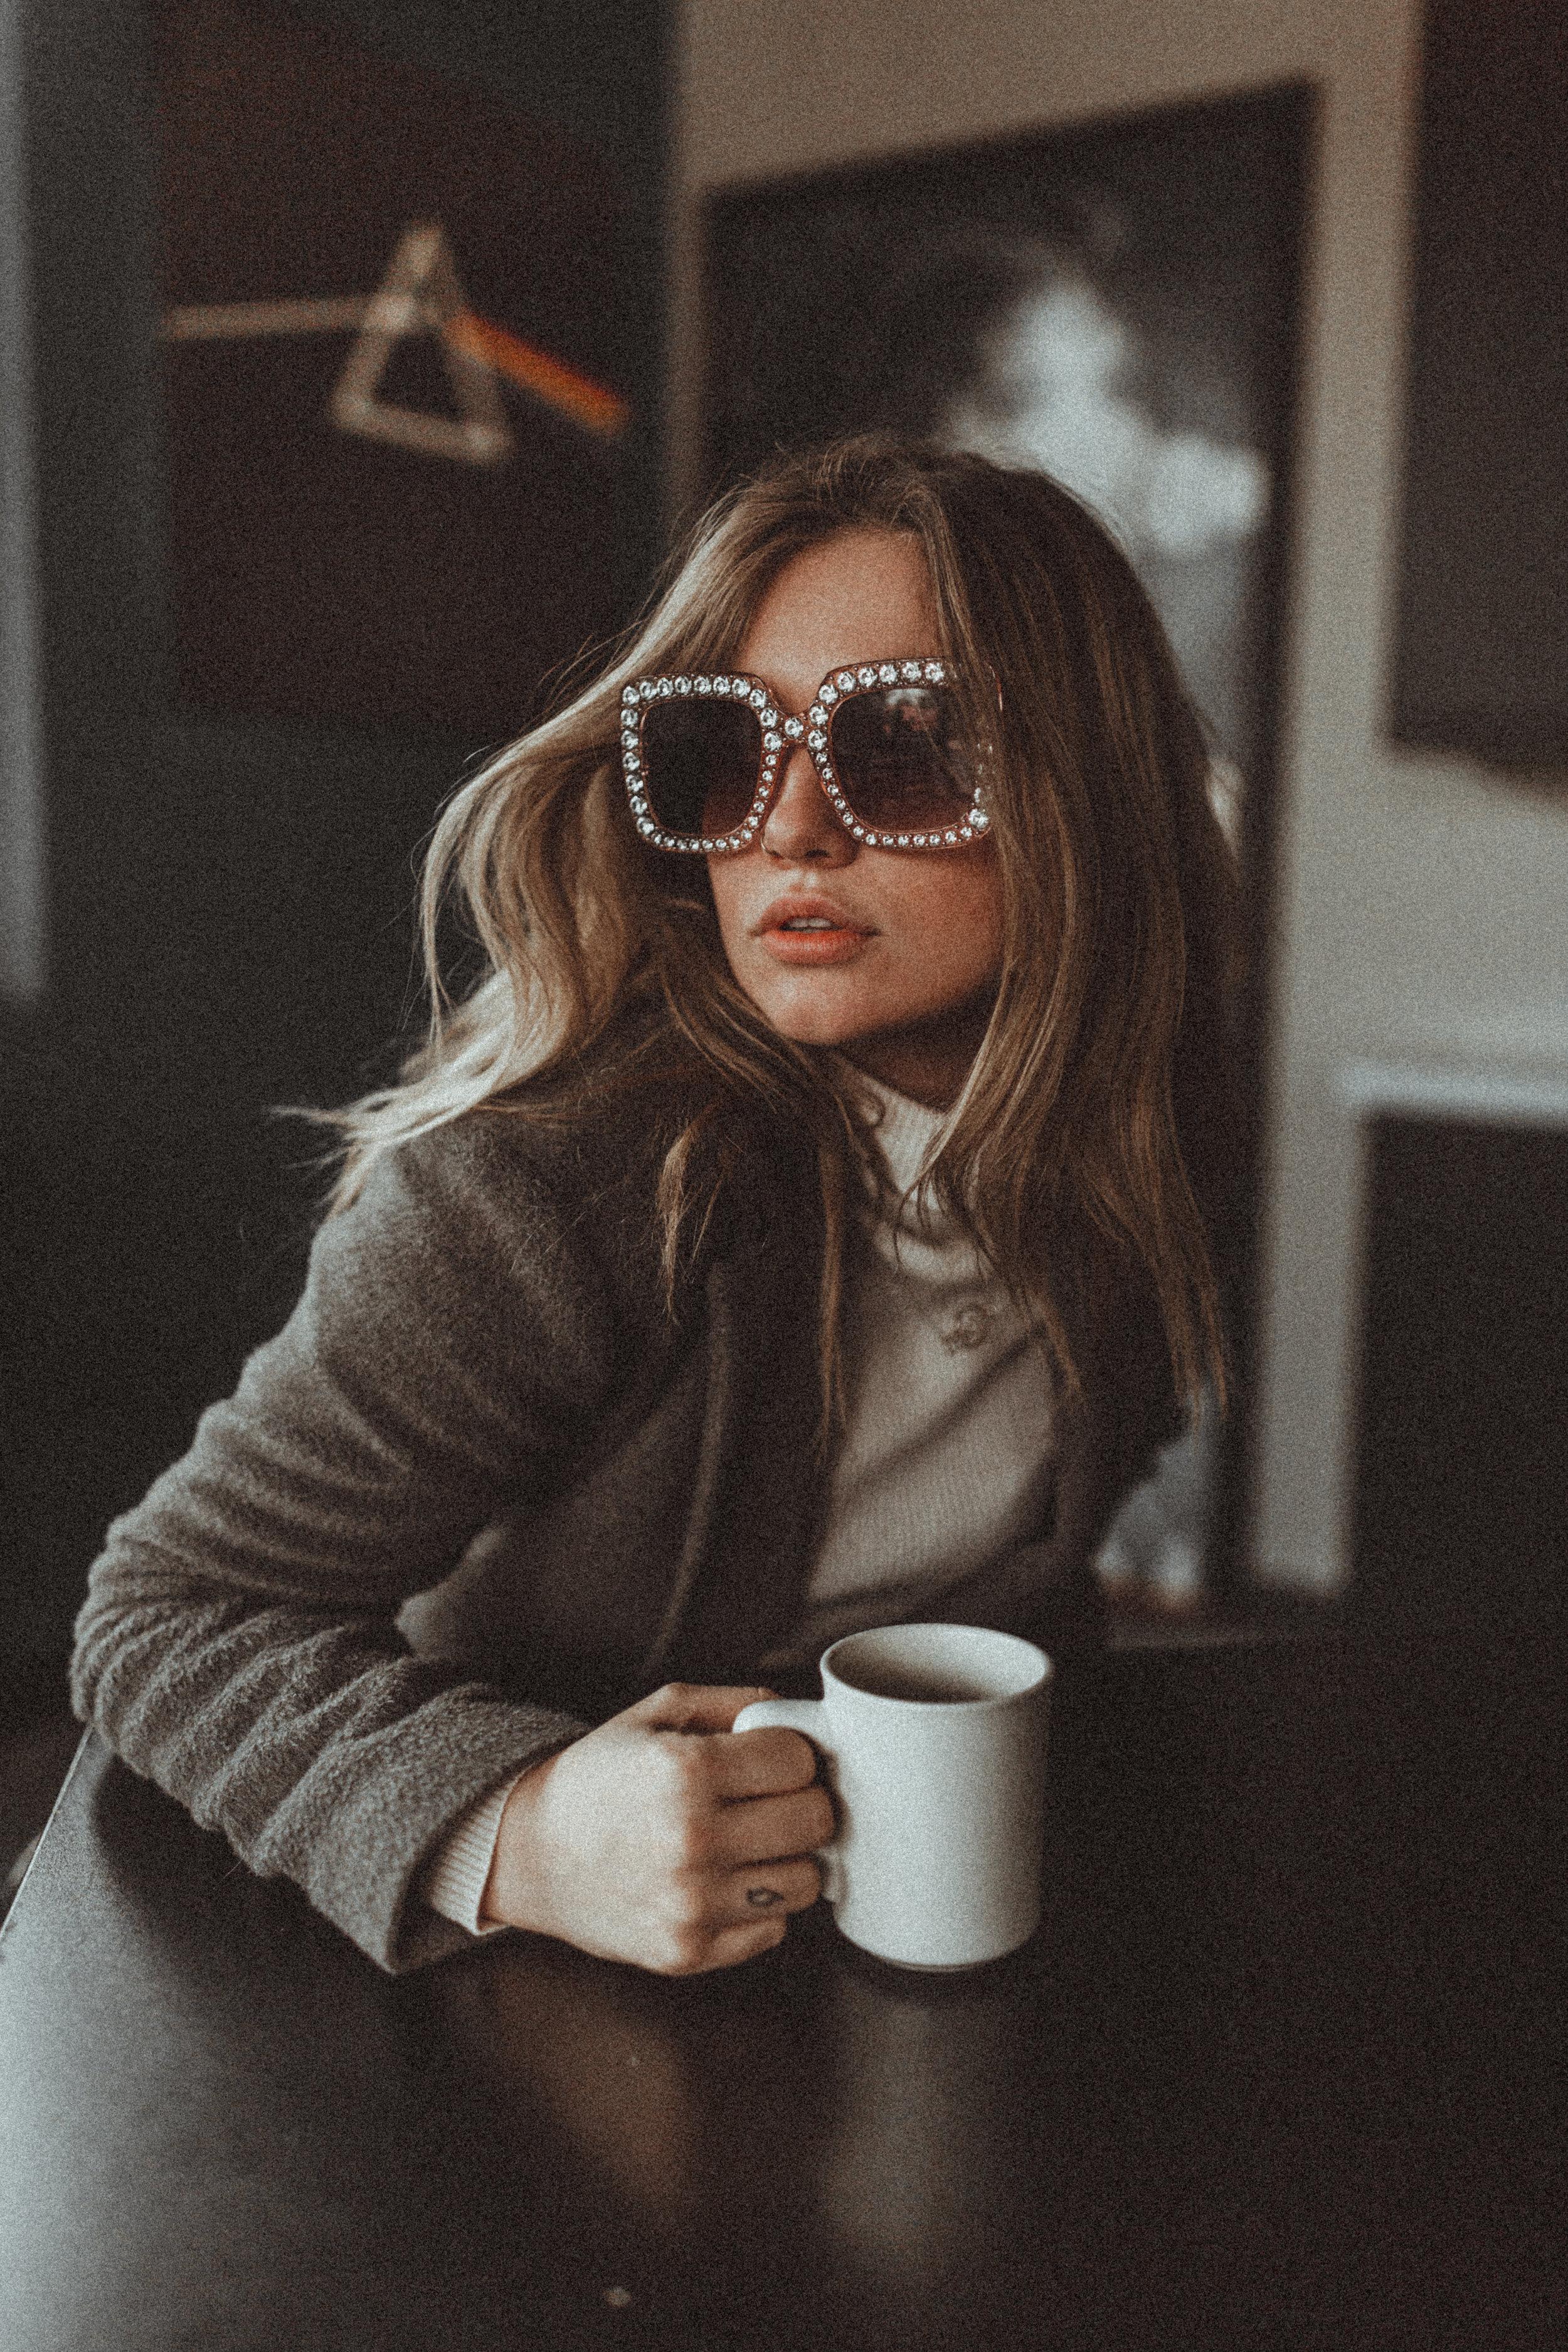 Alexa Ace / Founder + CEO